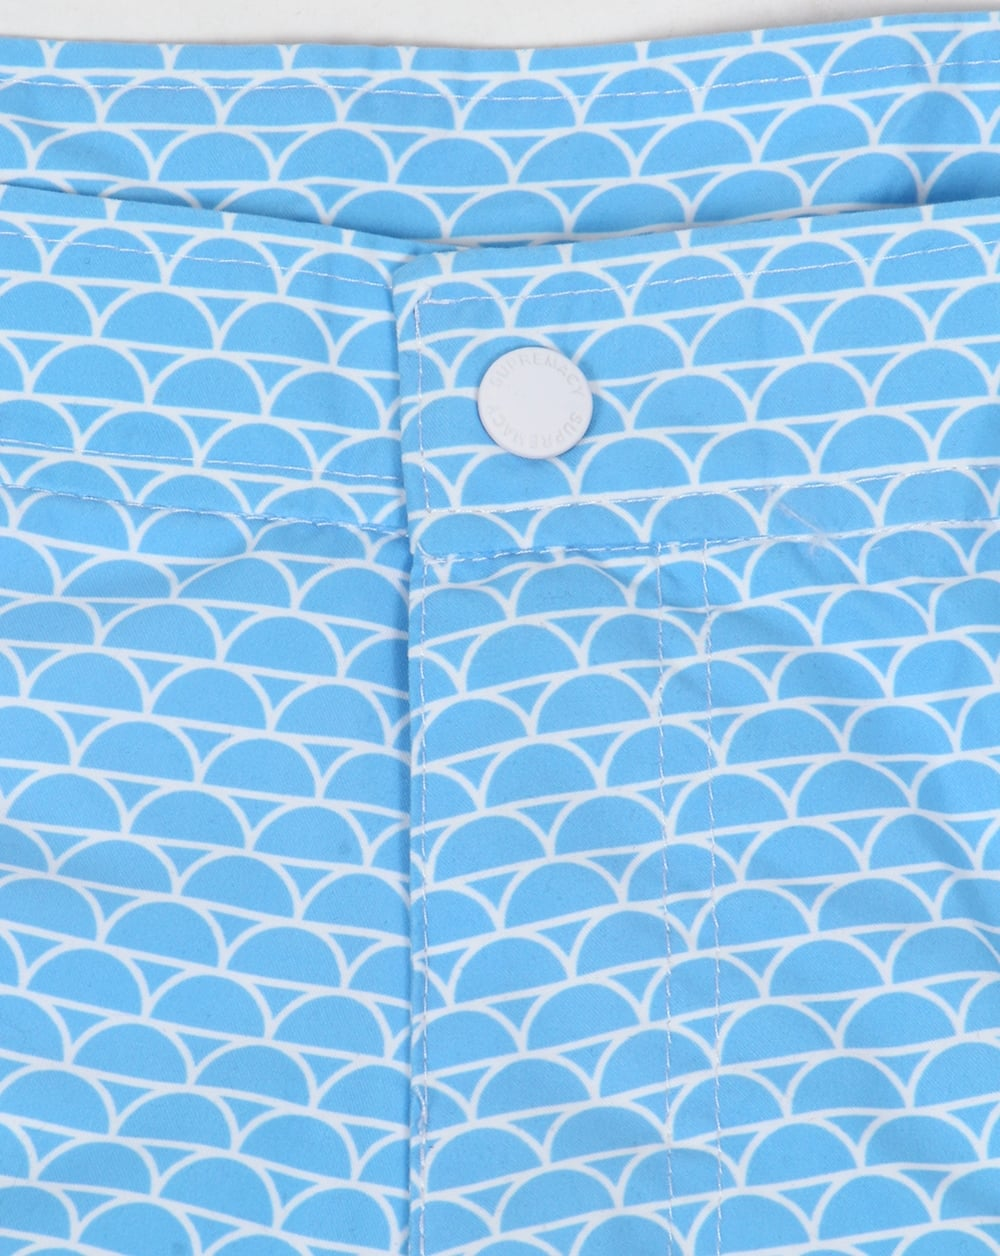 eeedb9e858 Supremacy Reef Tailored Swim Shorts Blue,beach,swimmers,pool,mens